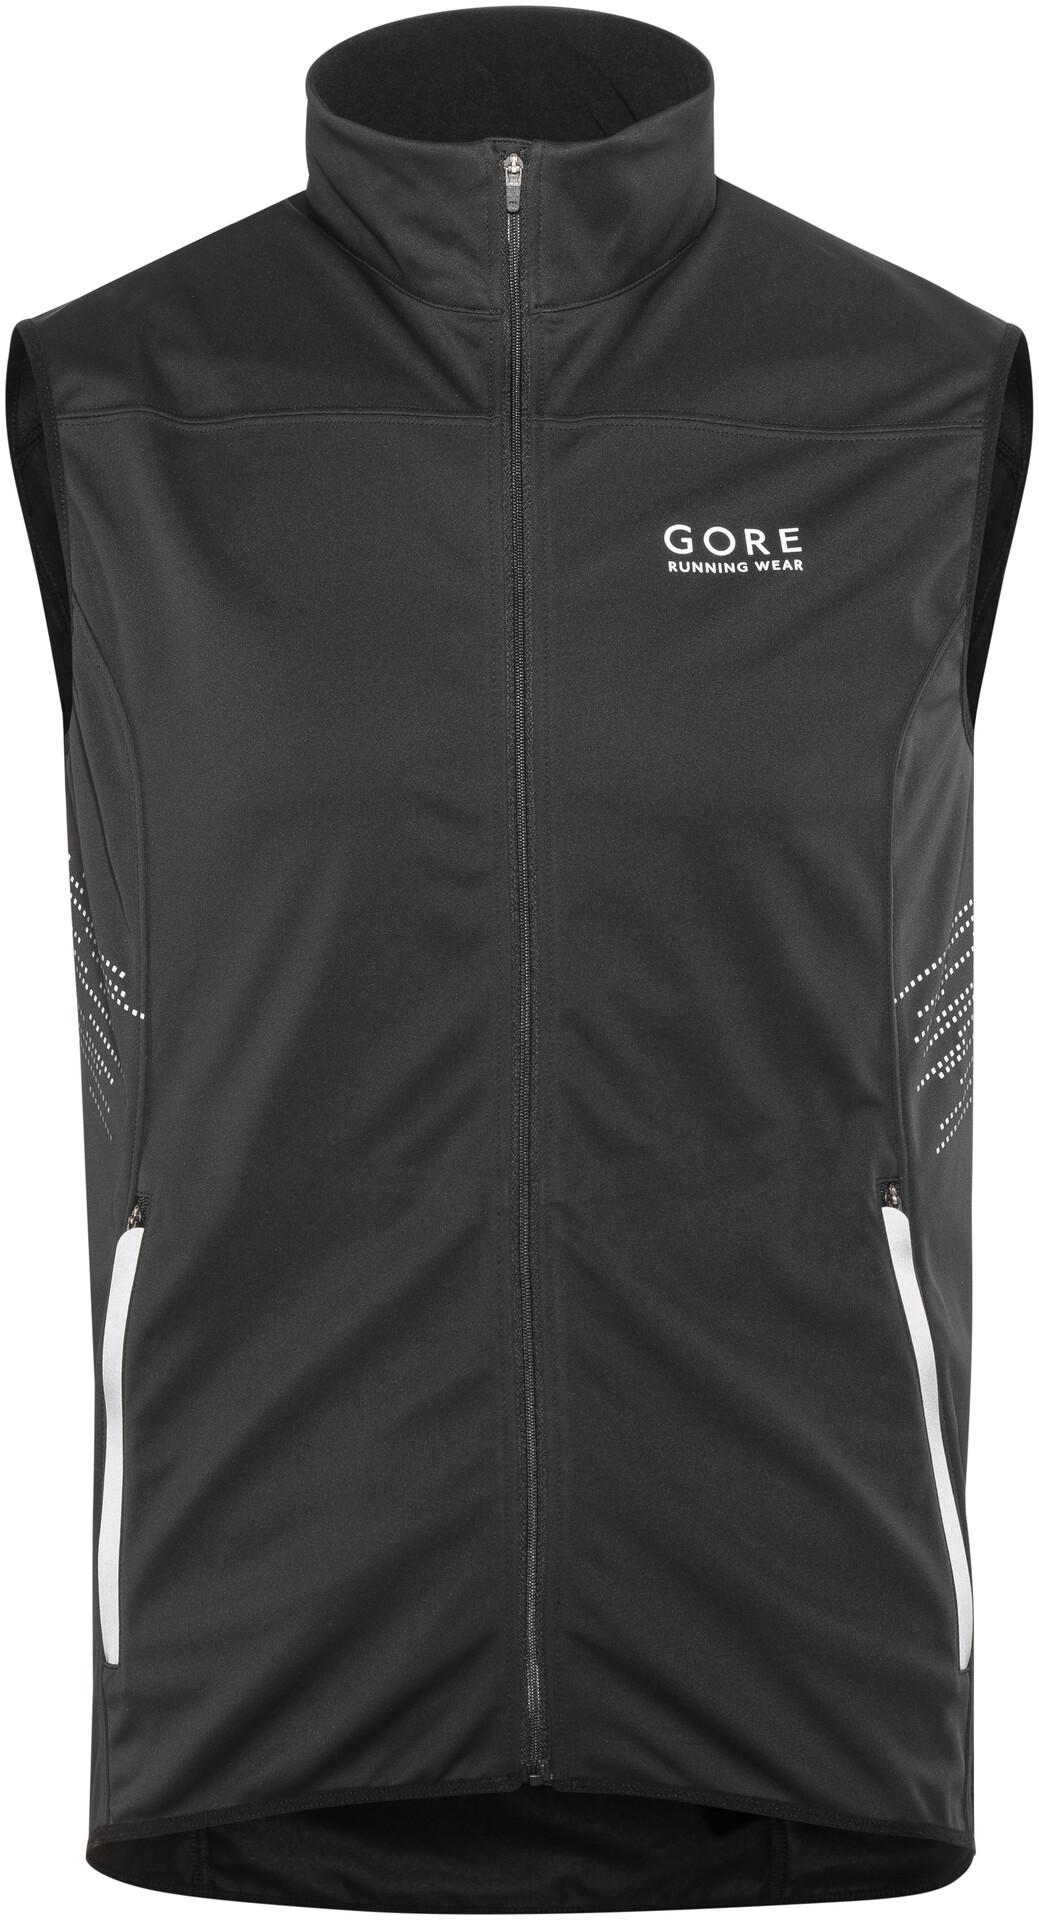 GORE RUNNING MYTHOS Gore Windstopper Jacket Black Herren